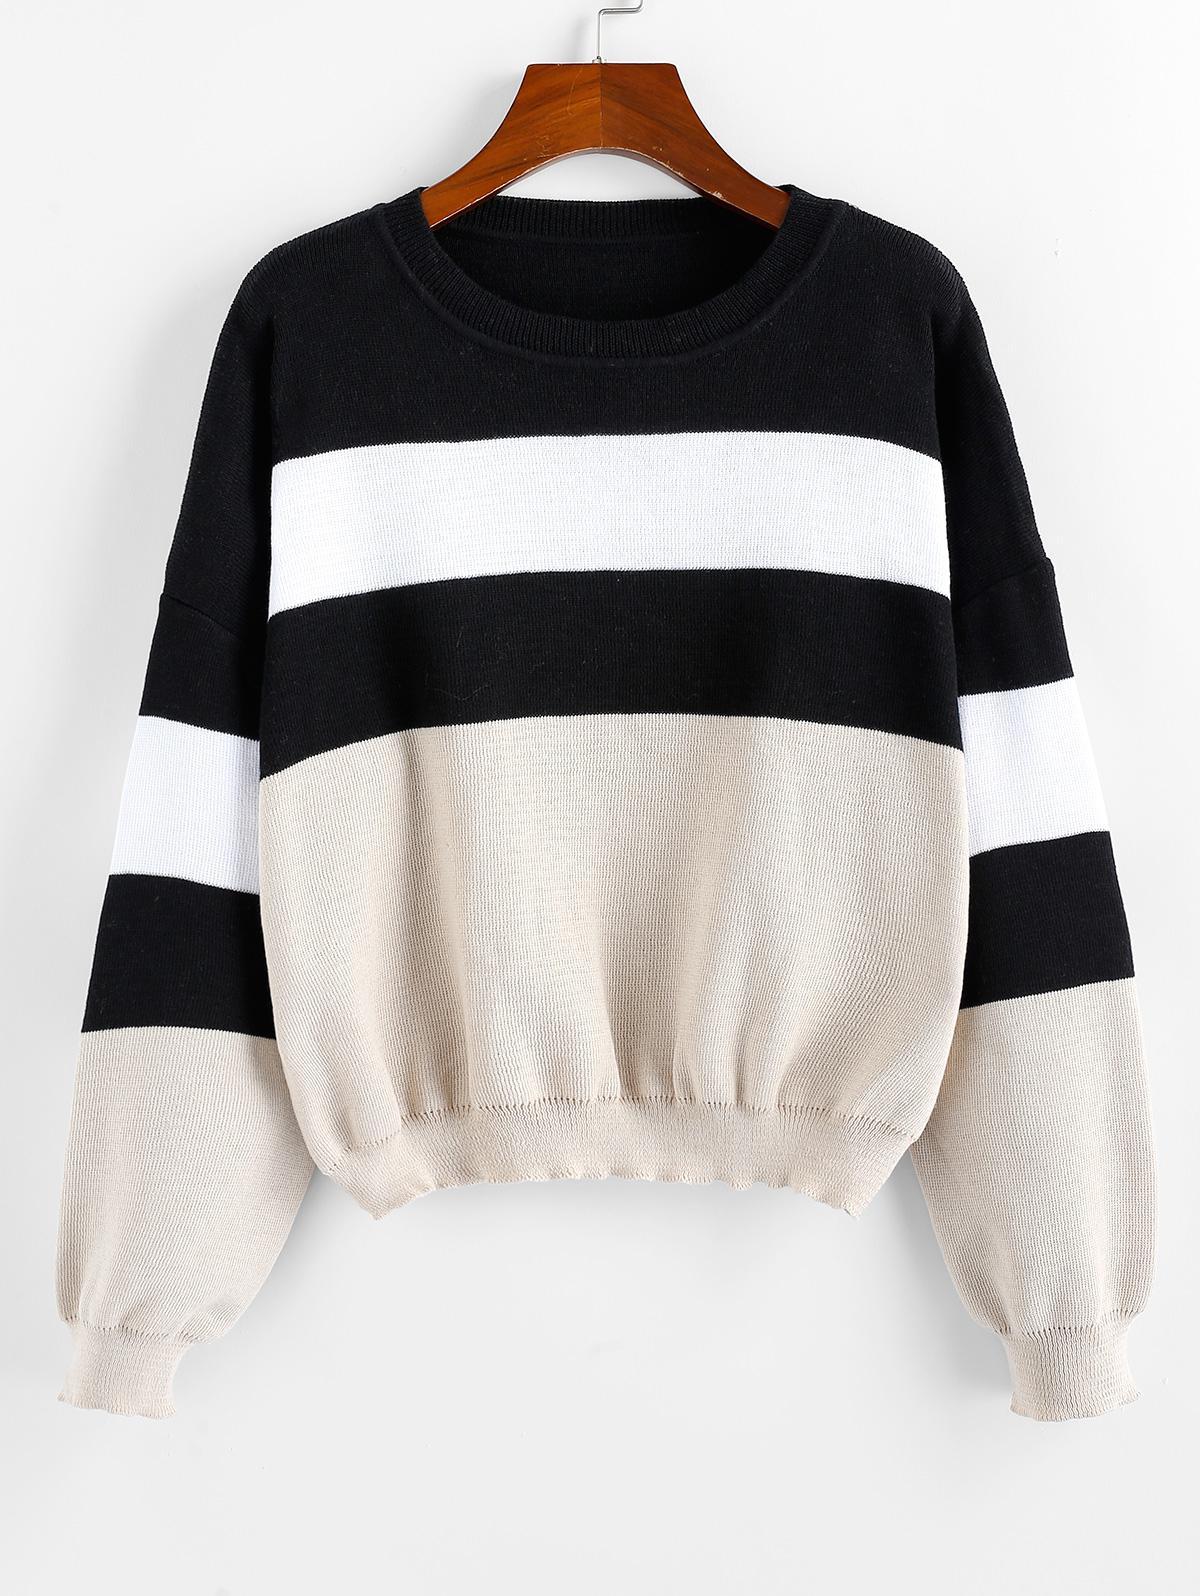 ZAFUL Colorblock Drop Shoulder Crew Neck Sweater